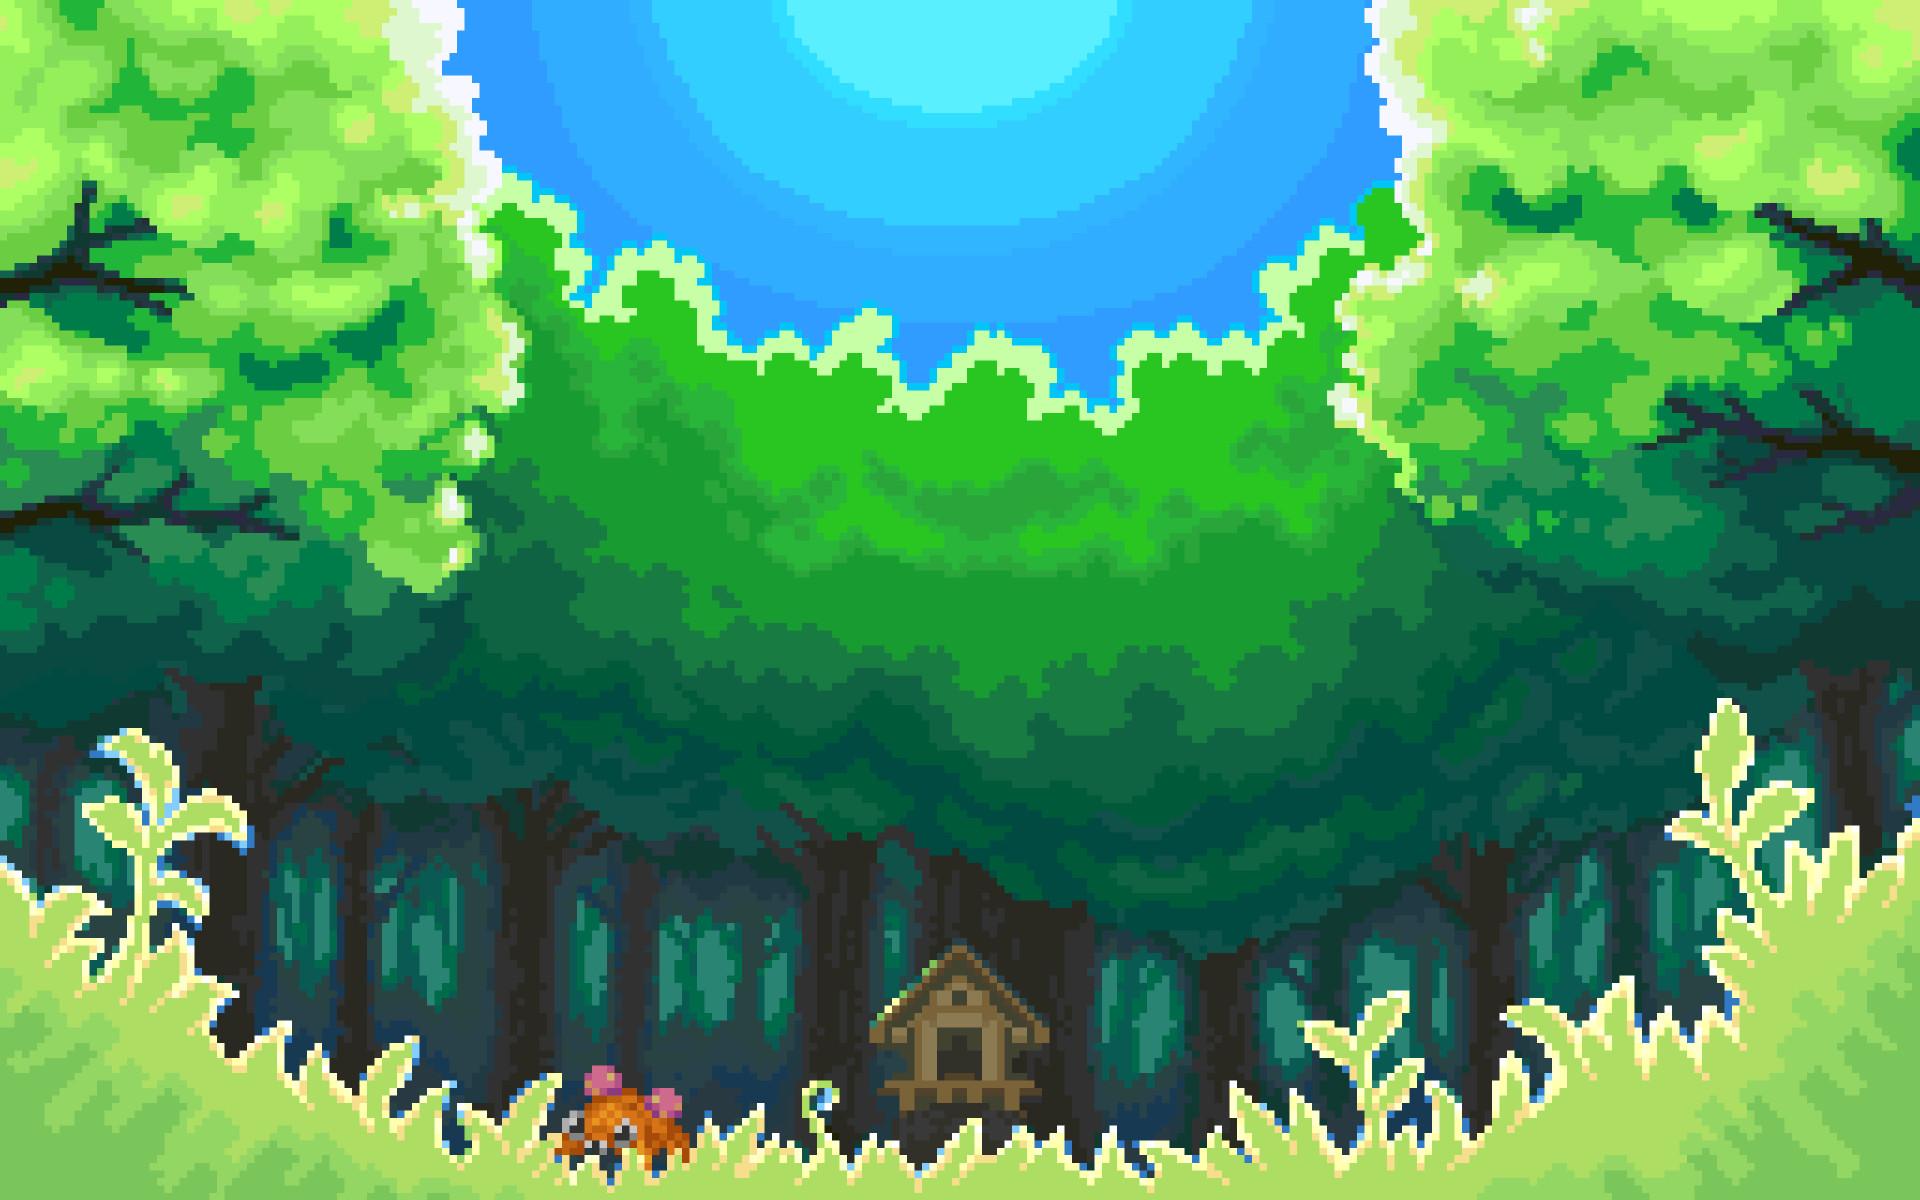 pokemon forest background 183��